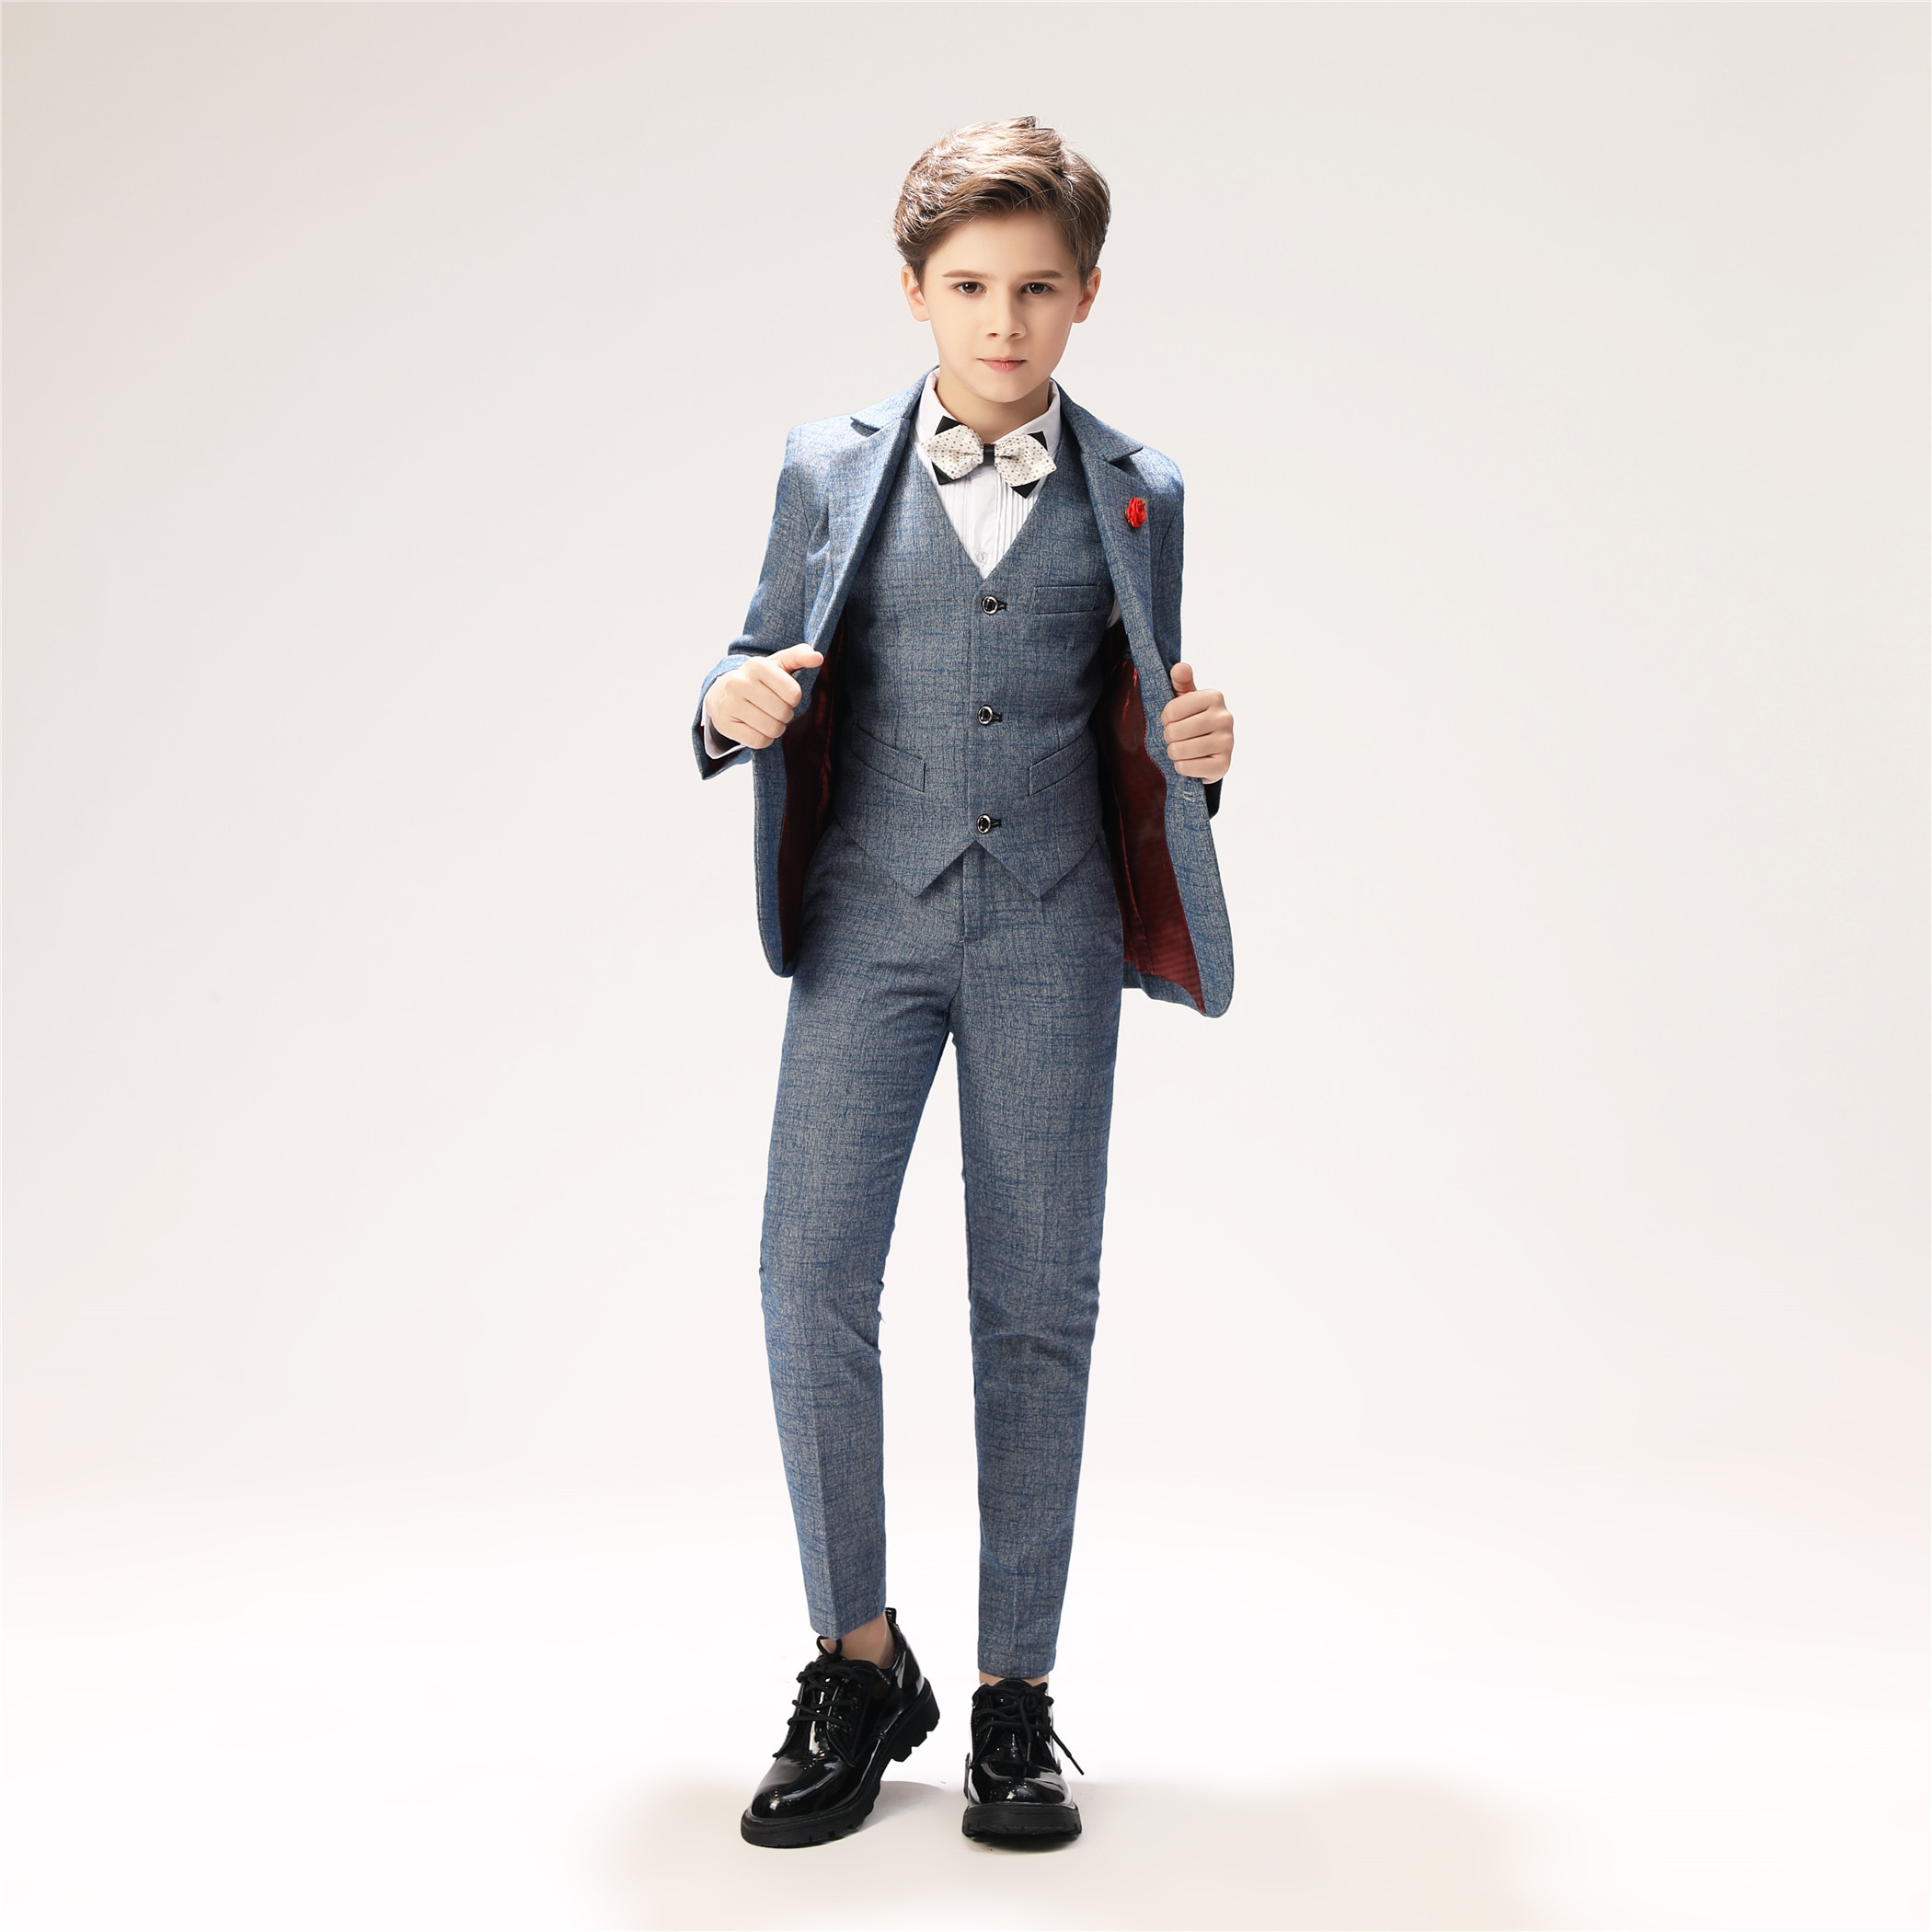 YuanLu Boys Suits Blazer Jacket For Wedding Piano 2019 BoysDress Woo Suit Autumn & Winter Kids Suits Child Clothes